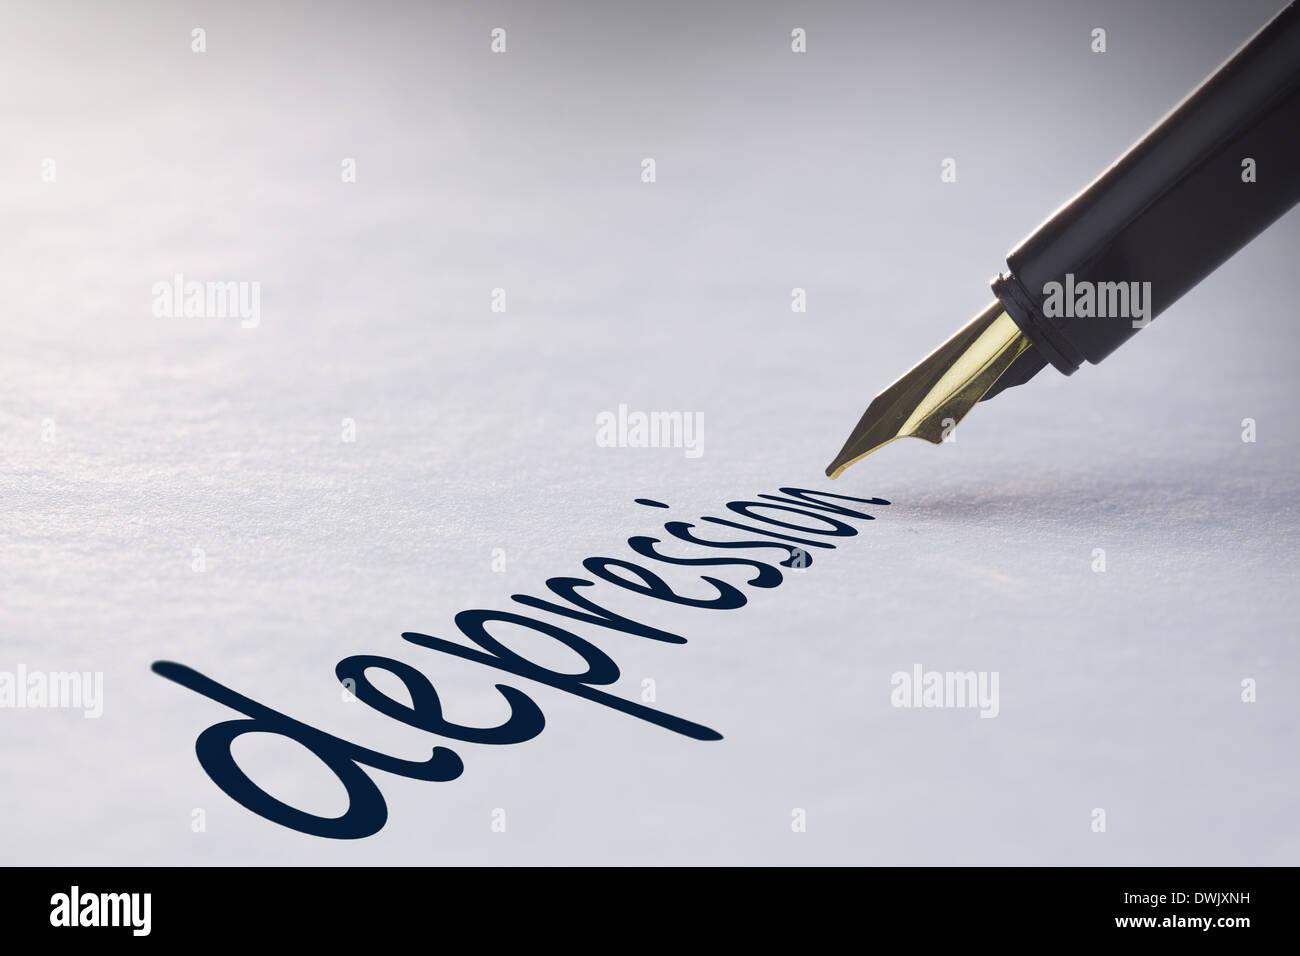 Fountain pen writing Depression - Stock Image